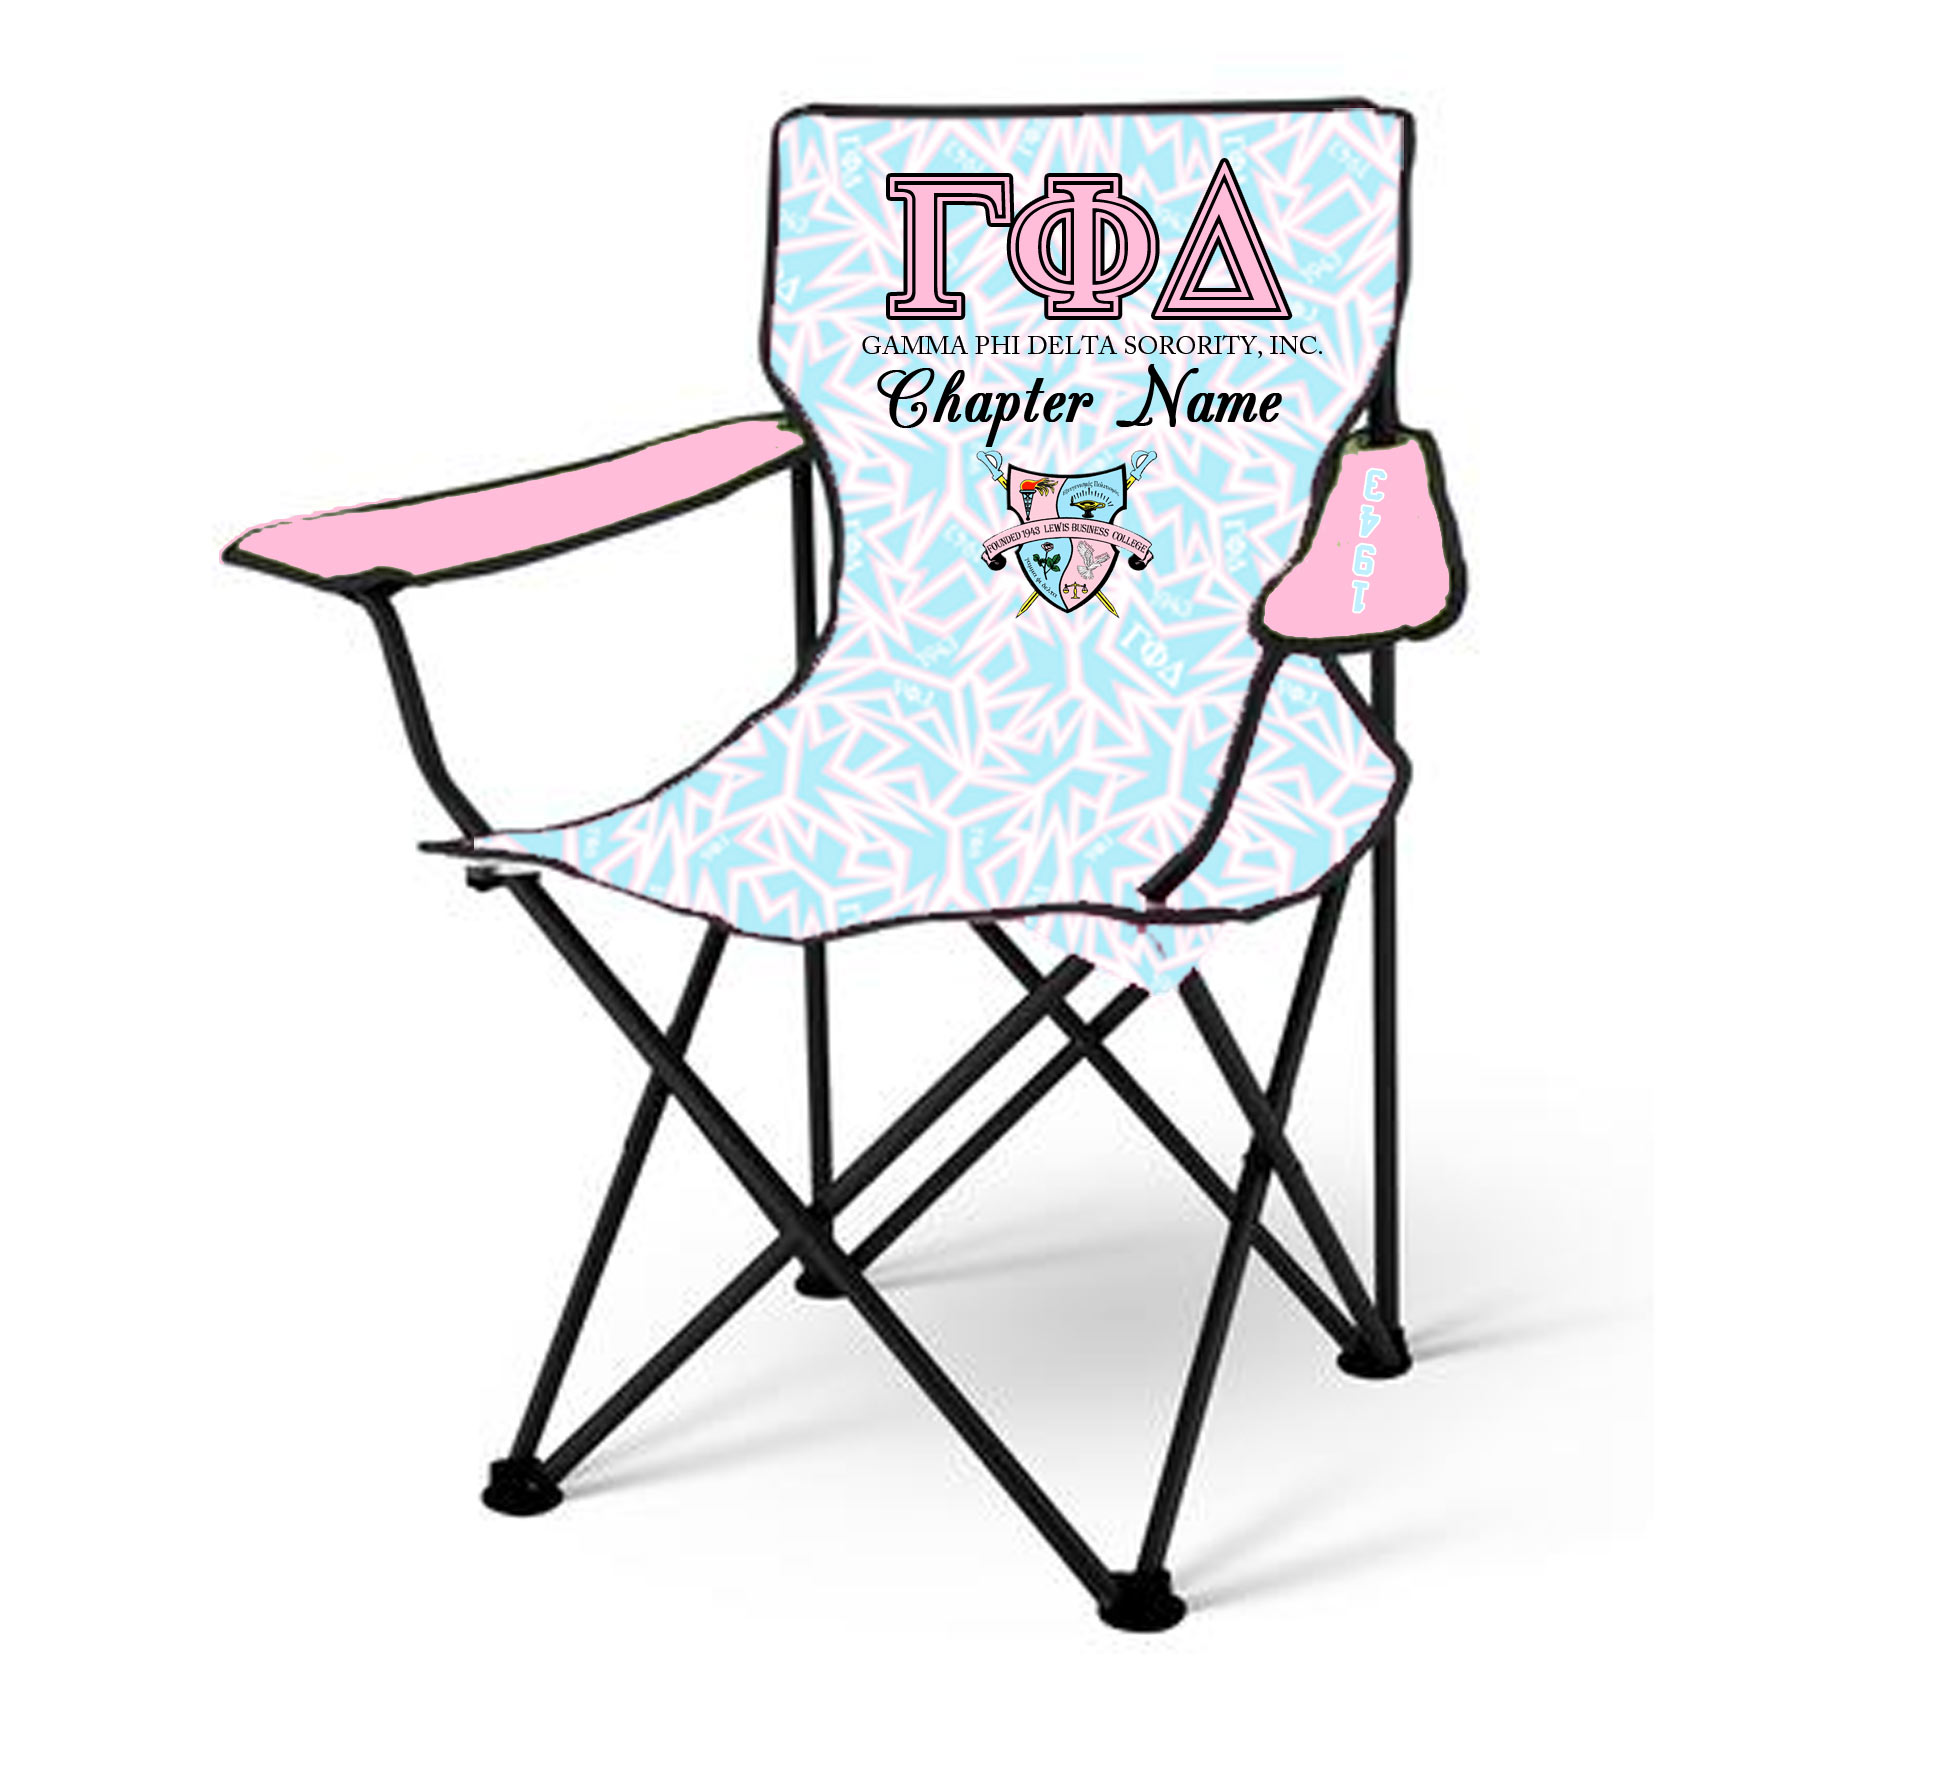 Gamma Phi Delta Sorority Lawn Chair – Forever Unique